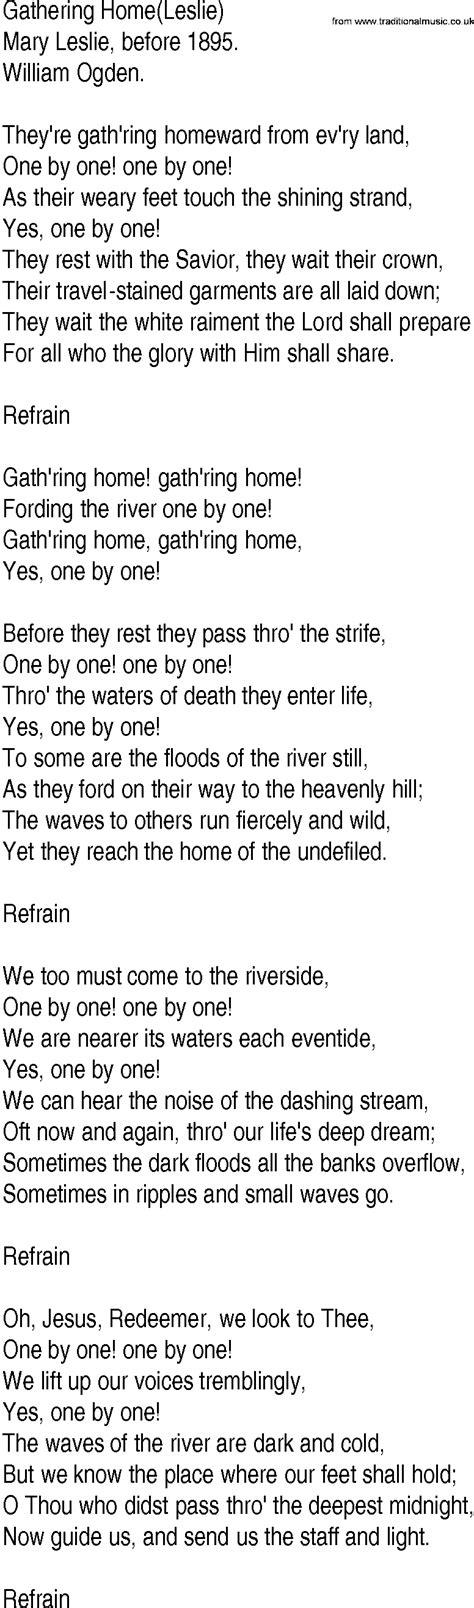 lyrics leslie hymn and gospel song lyrics for gathering home leslie by